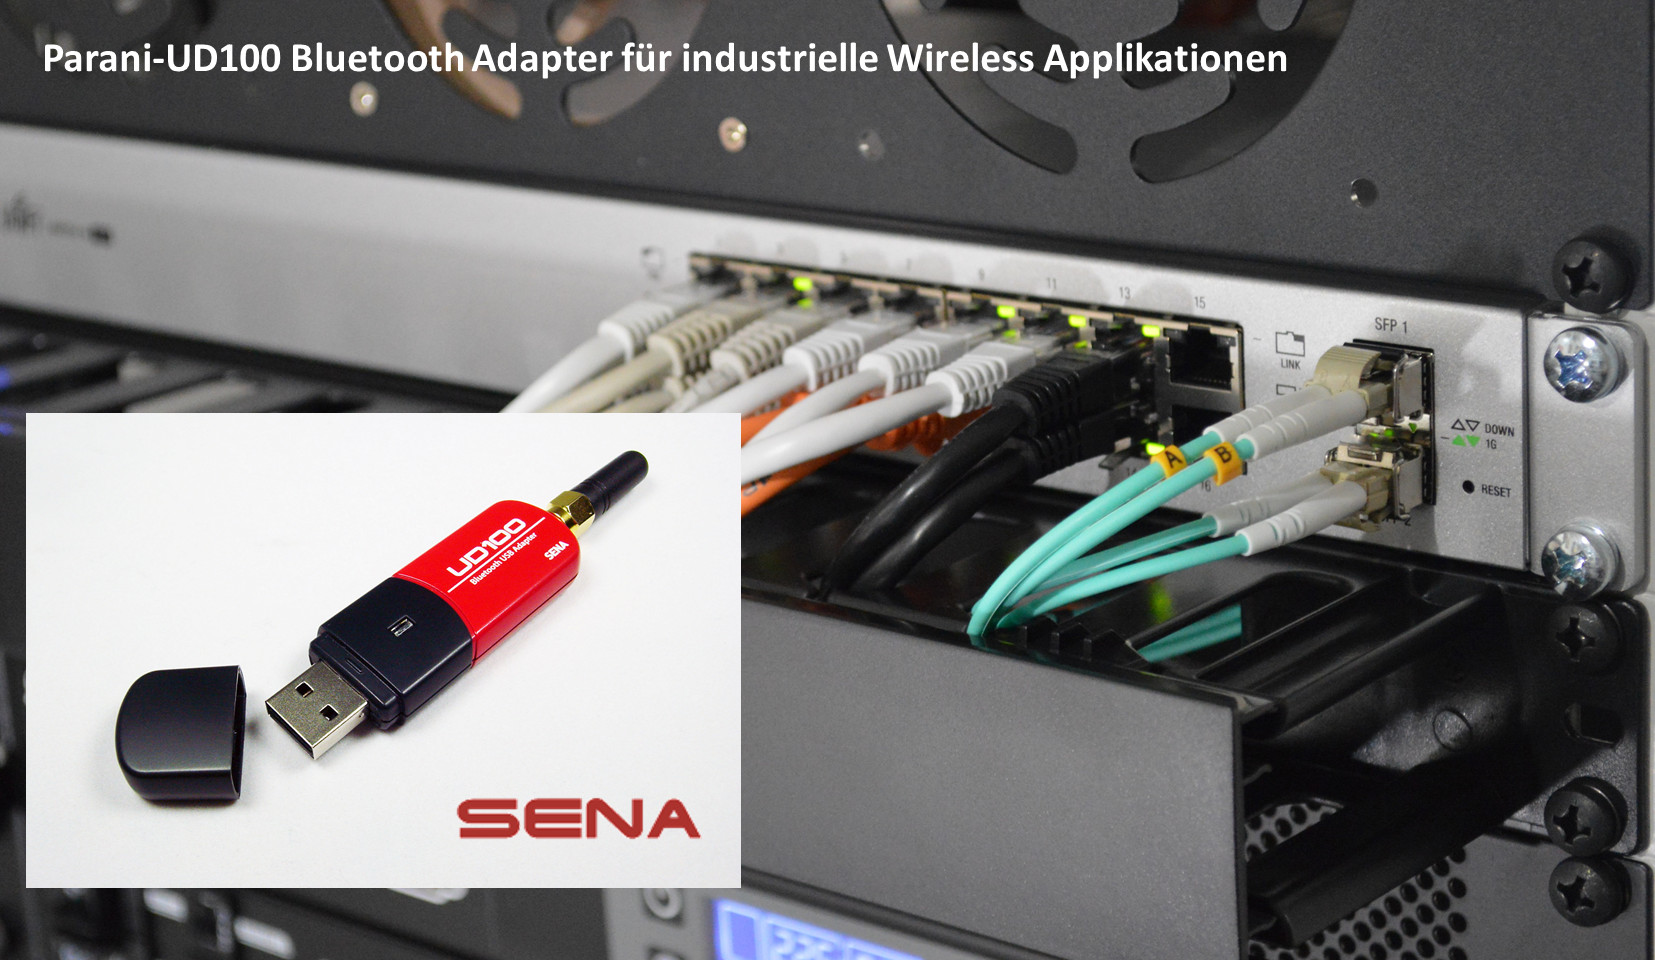 Parani-UD100 Bluetooth USB Adapter